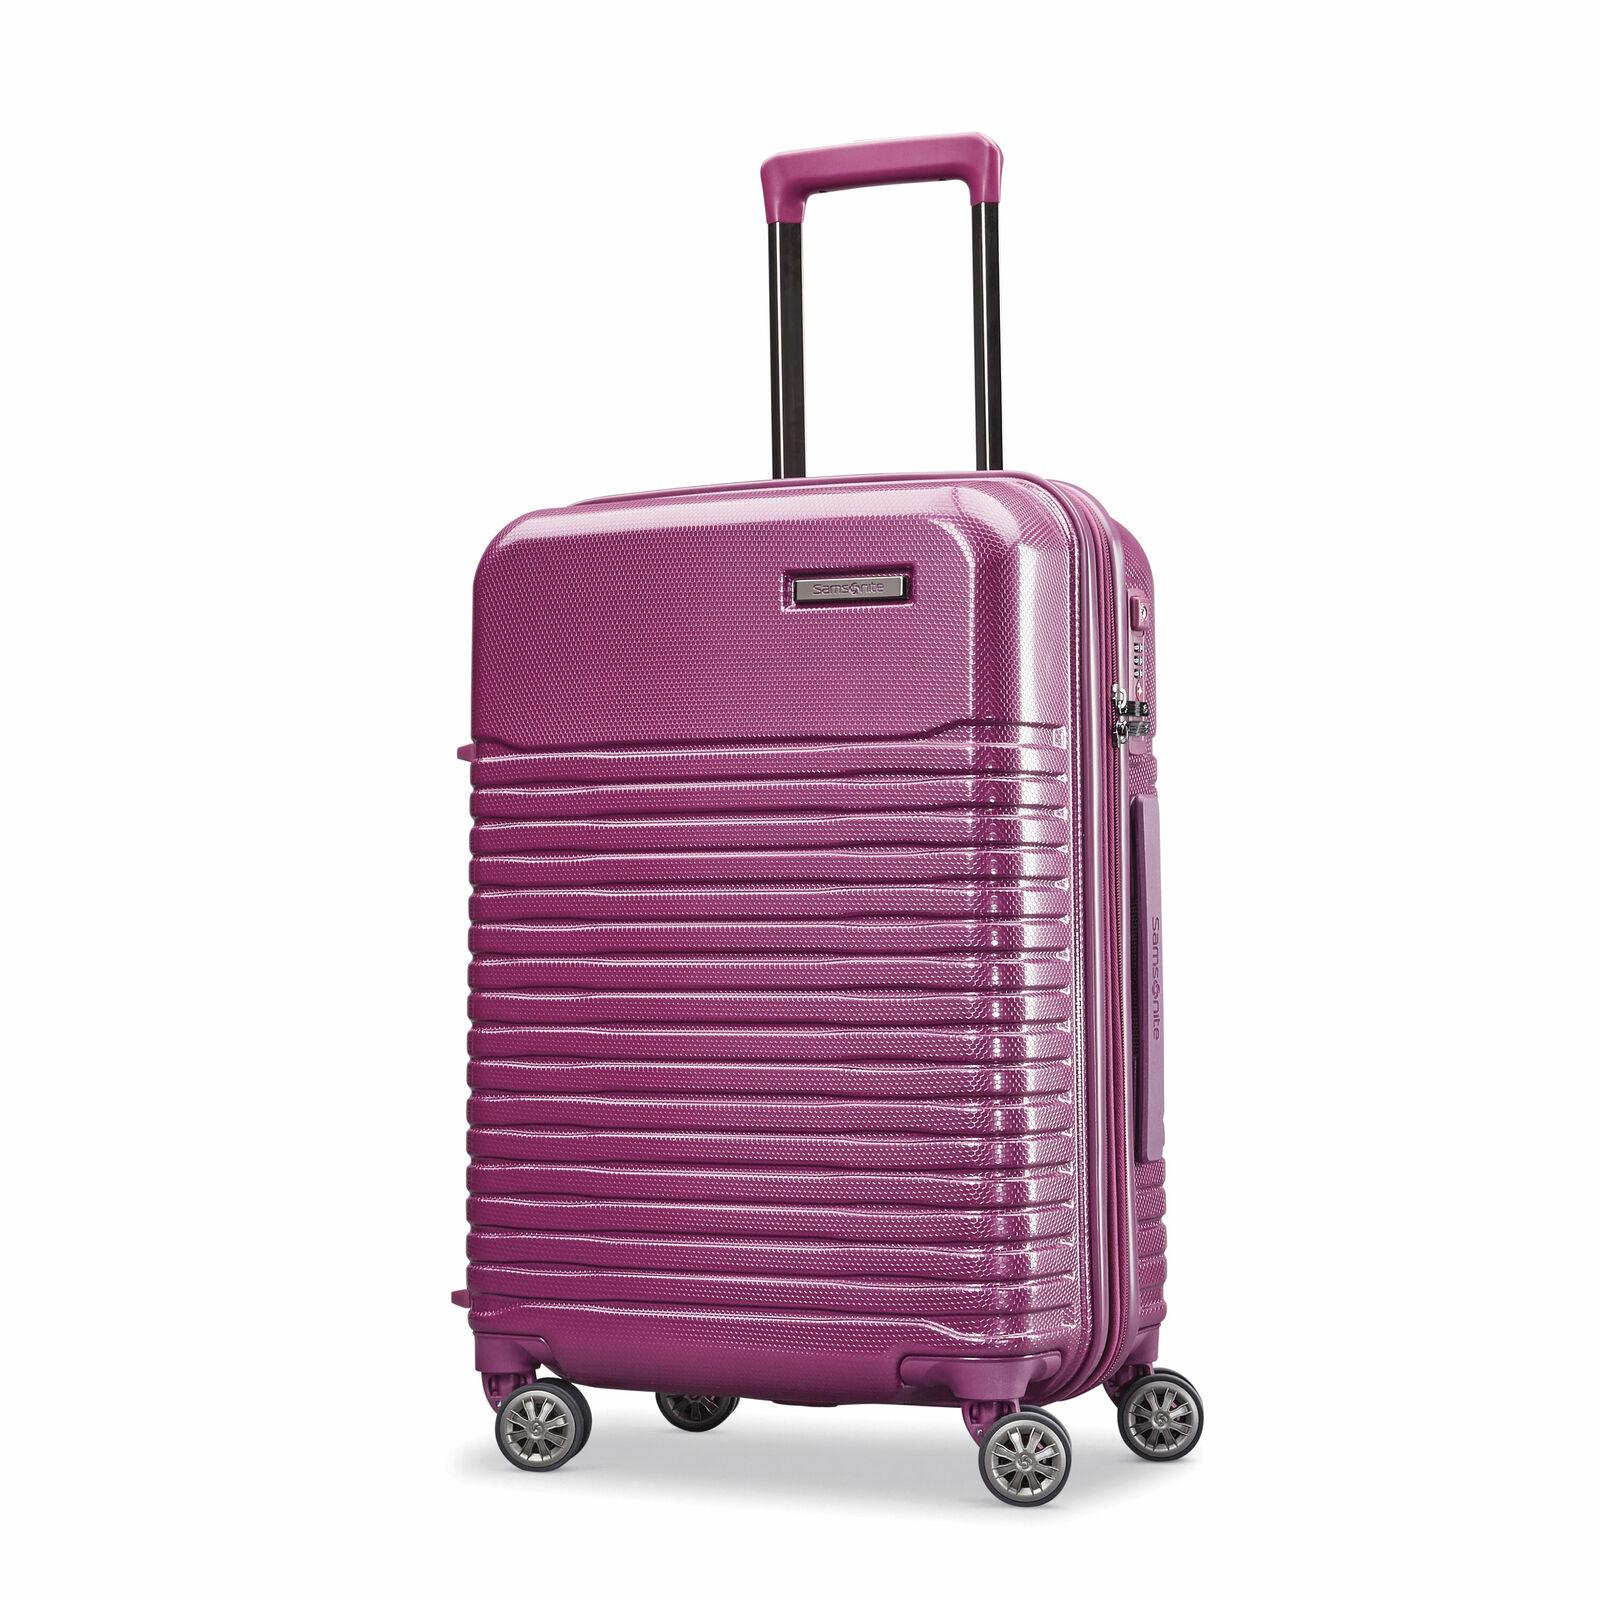 "Samsonite Spettro Spinner Luggage: 20"" (Purple) $56, 25"" (Blue or Purple) $64, 29"" (Purple) $72 + Free Shipping"